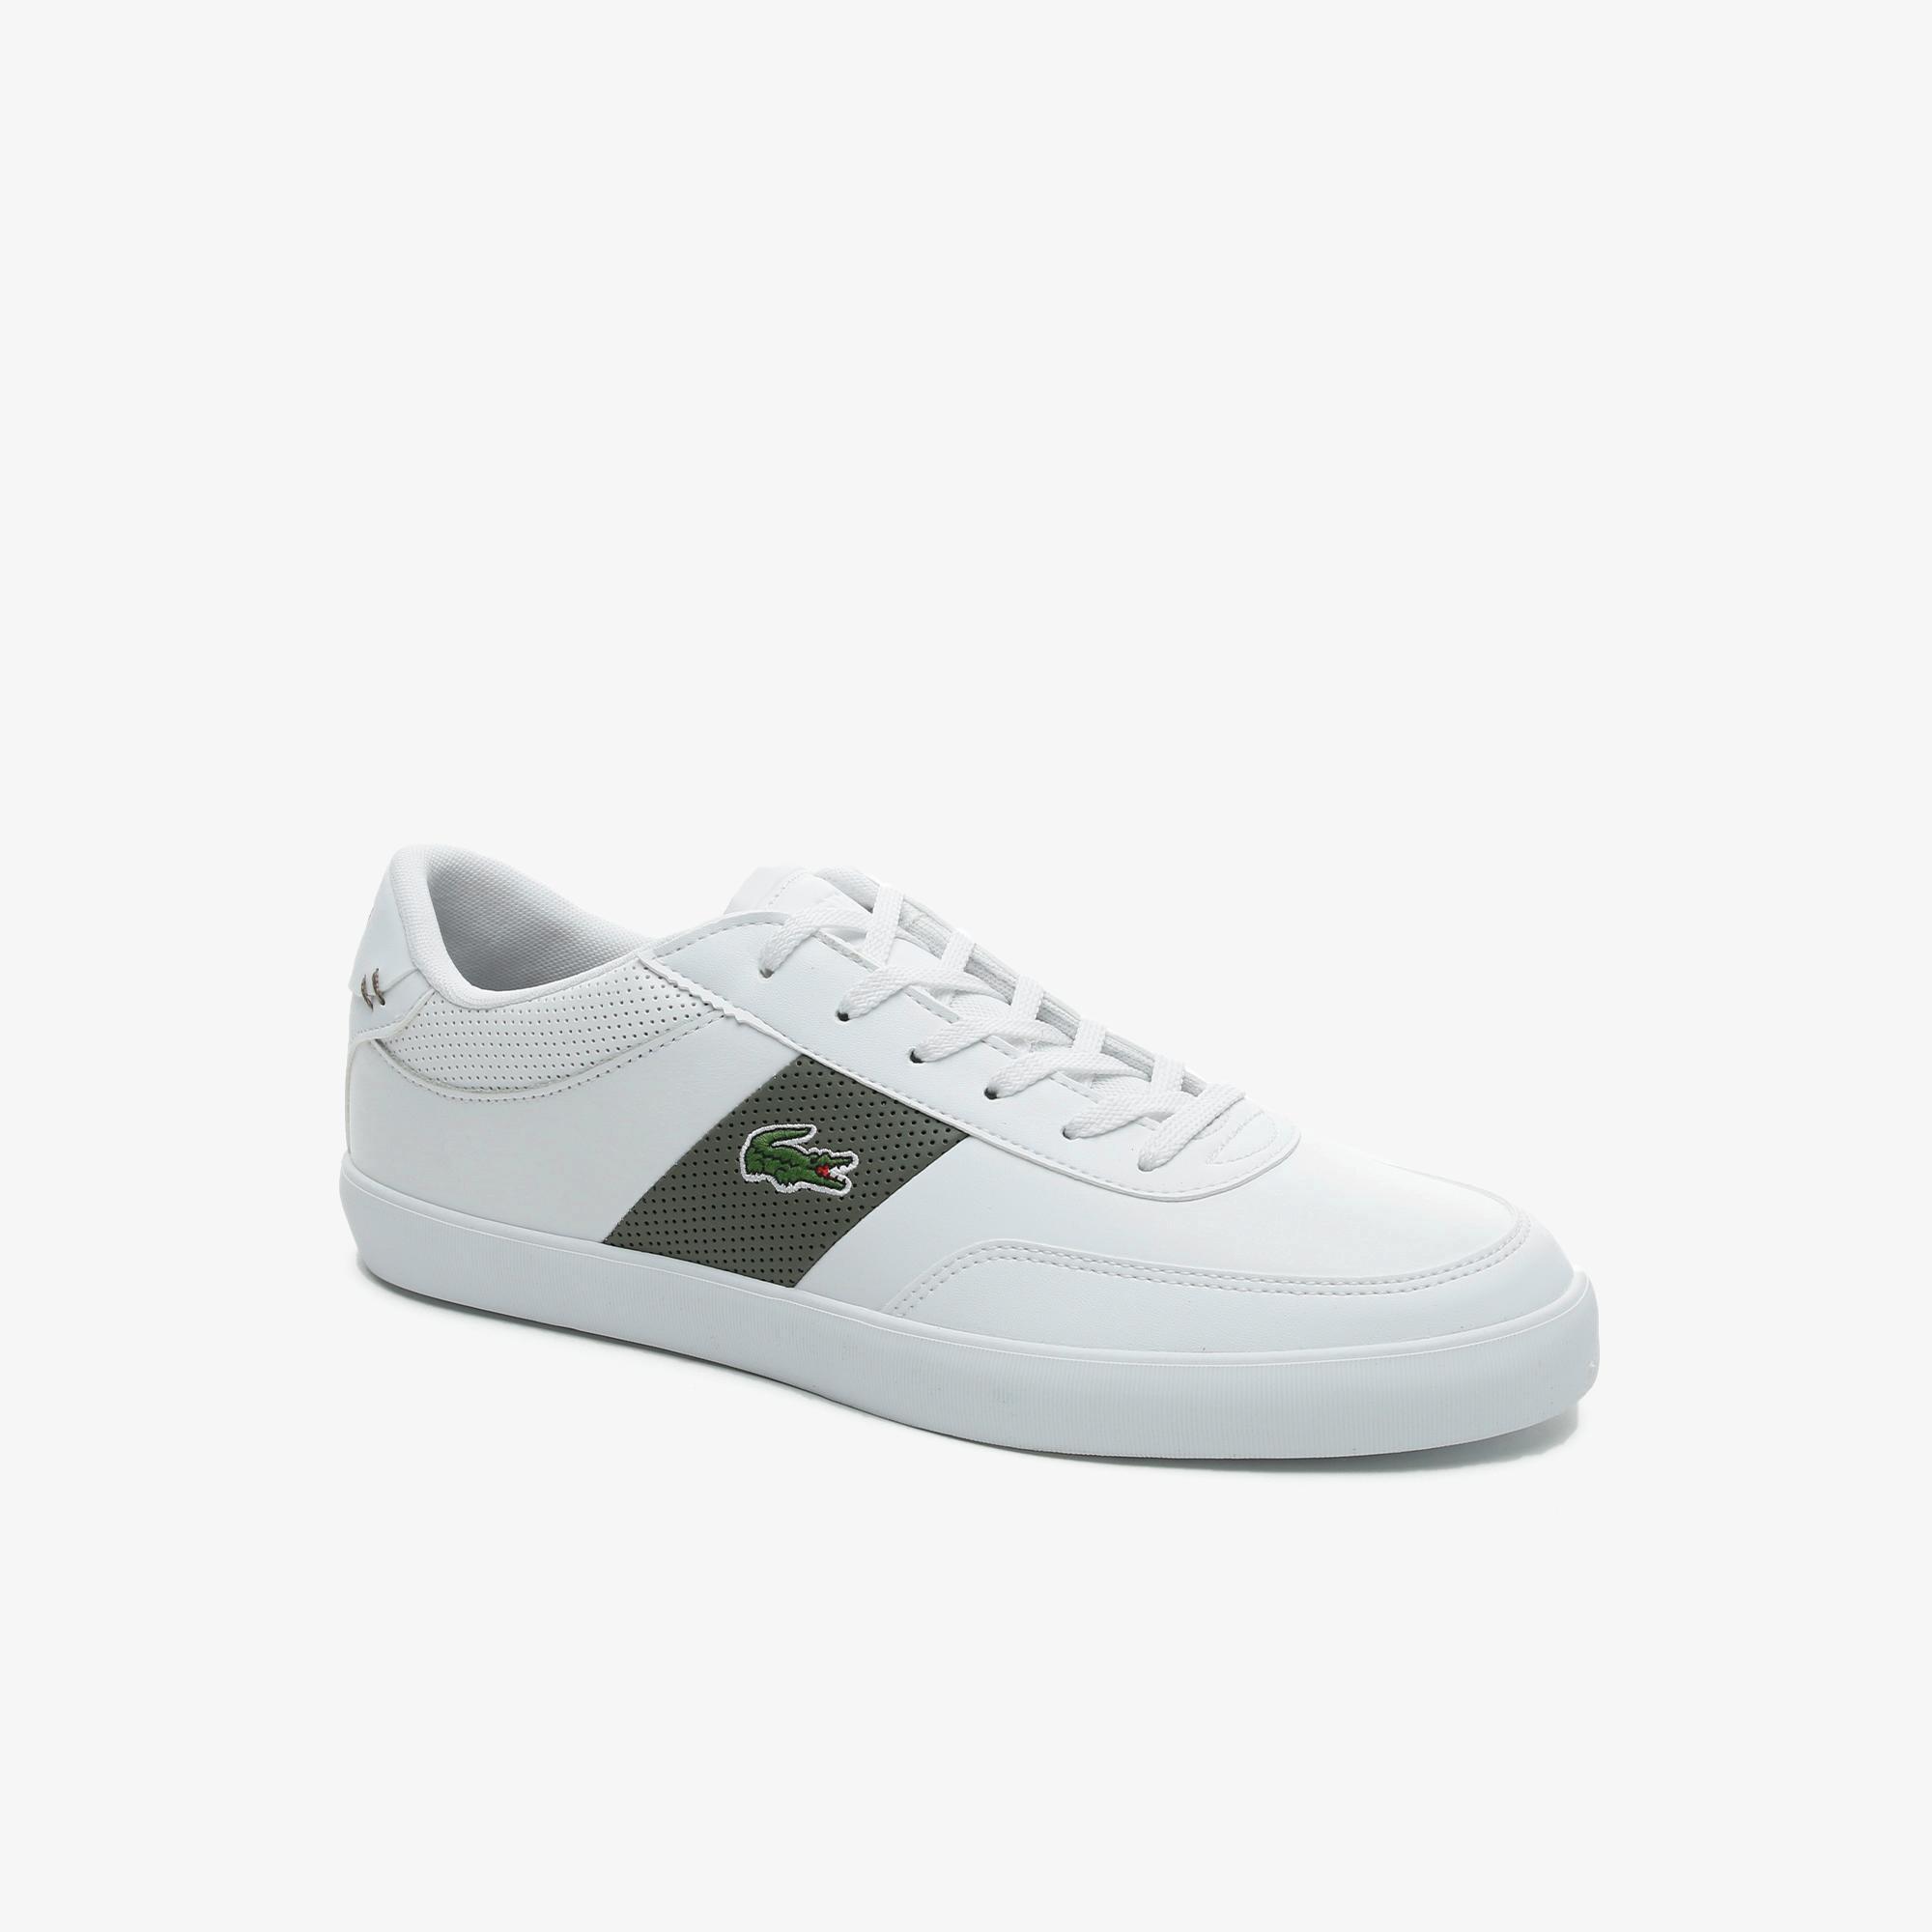 Lacoste Court-Master 0721 1 Cma Erkek Beyaz - Haki Sneaker